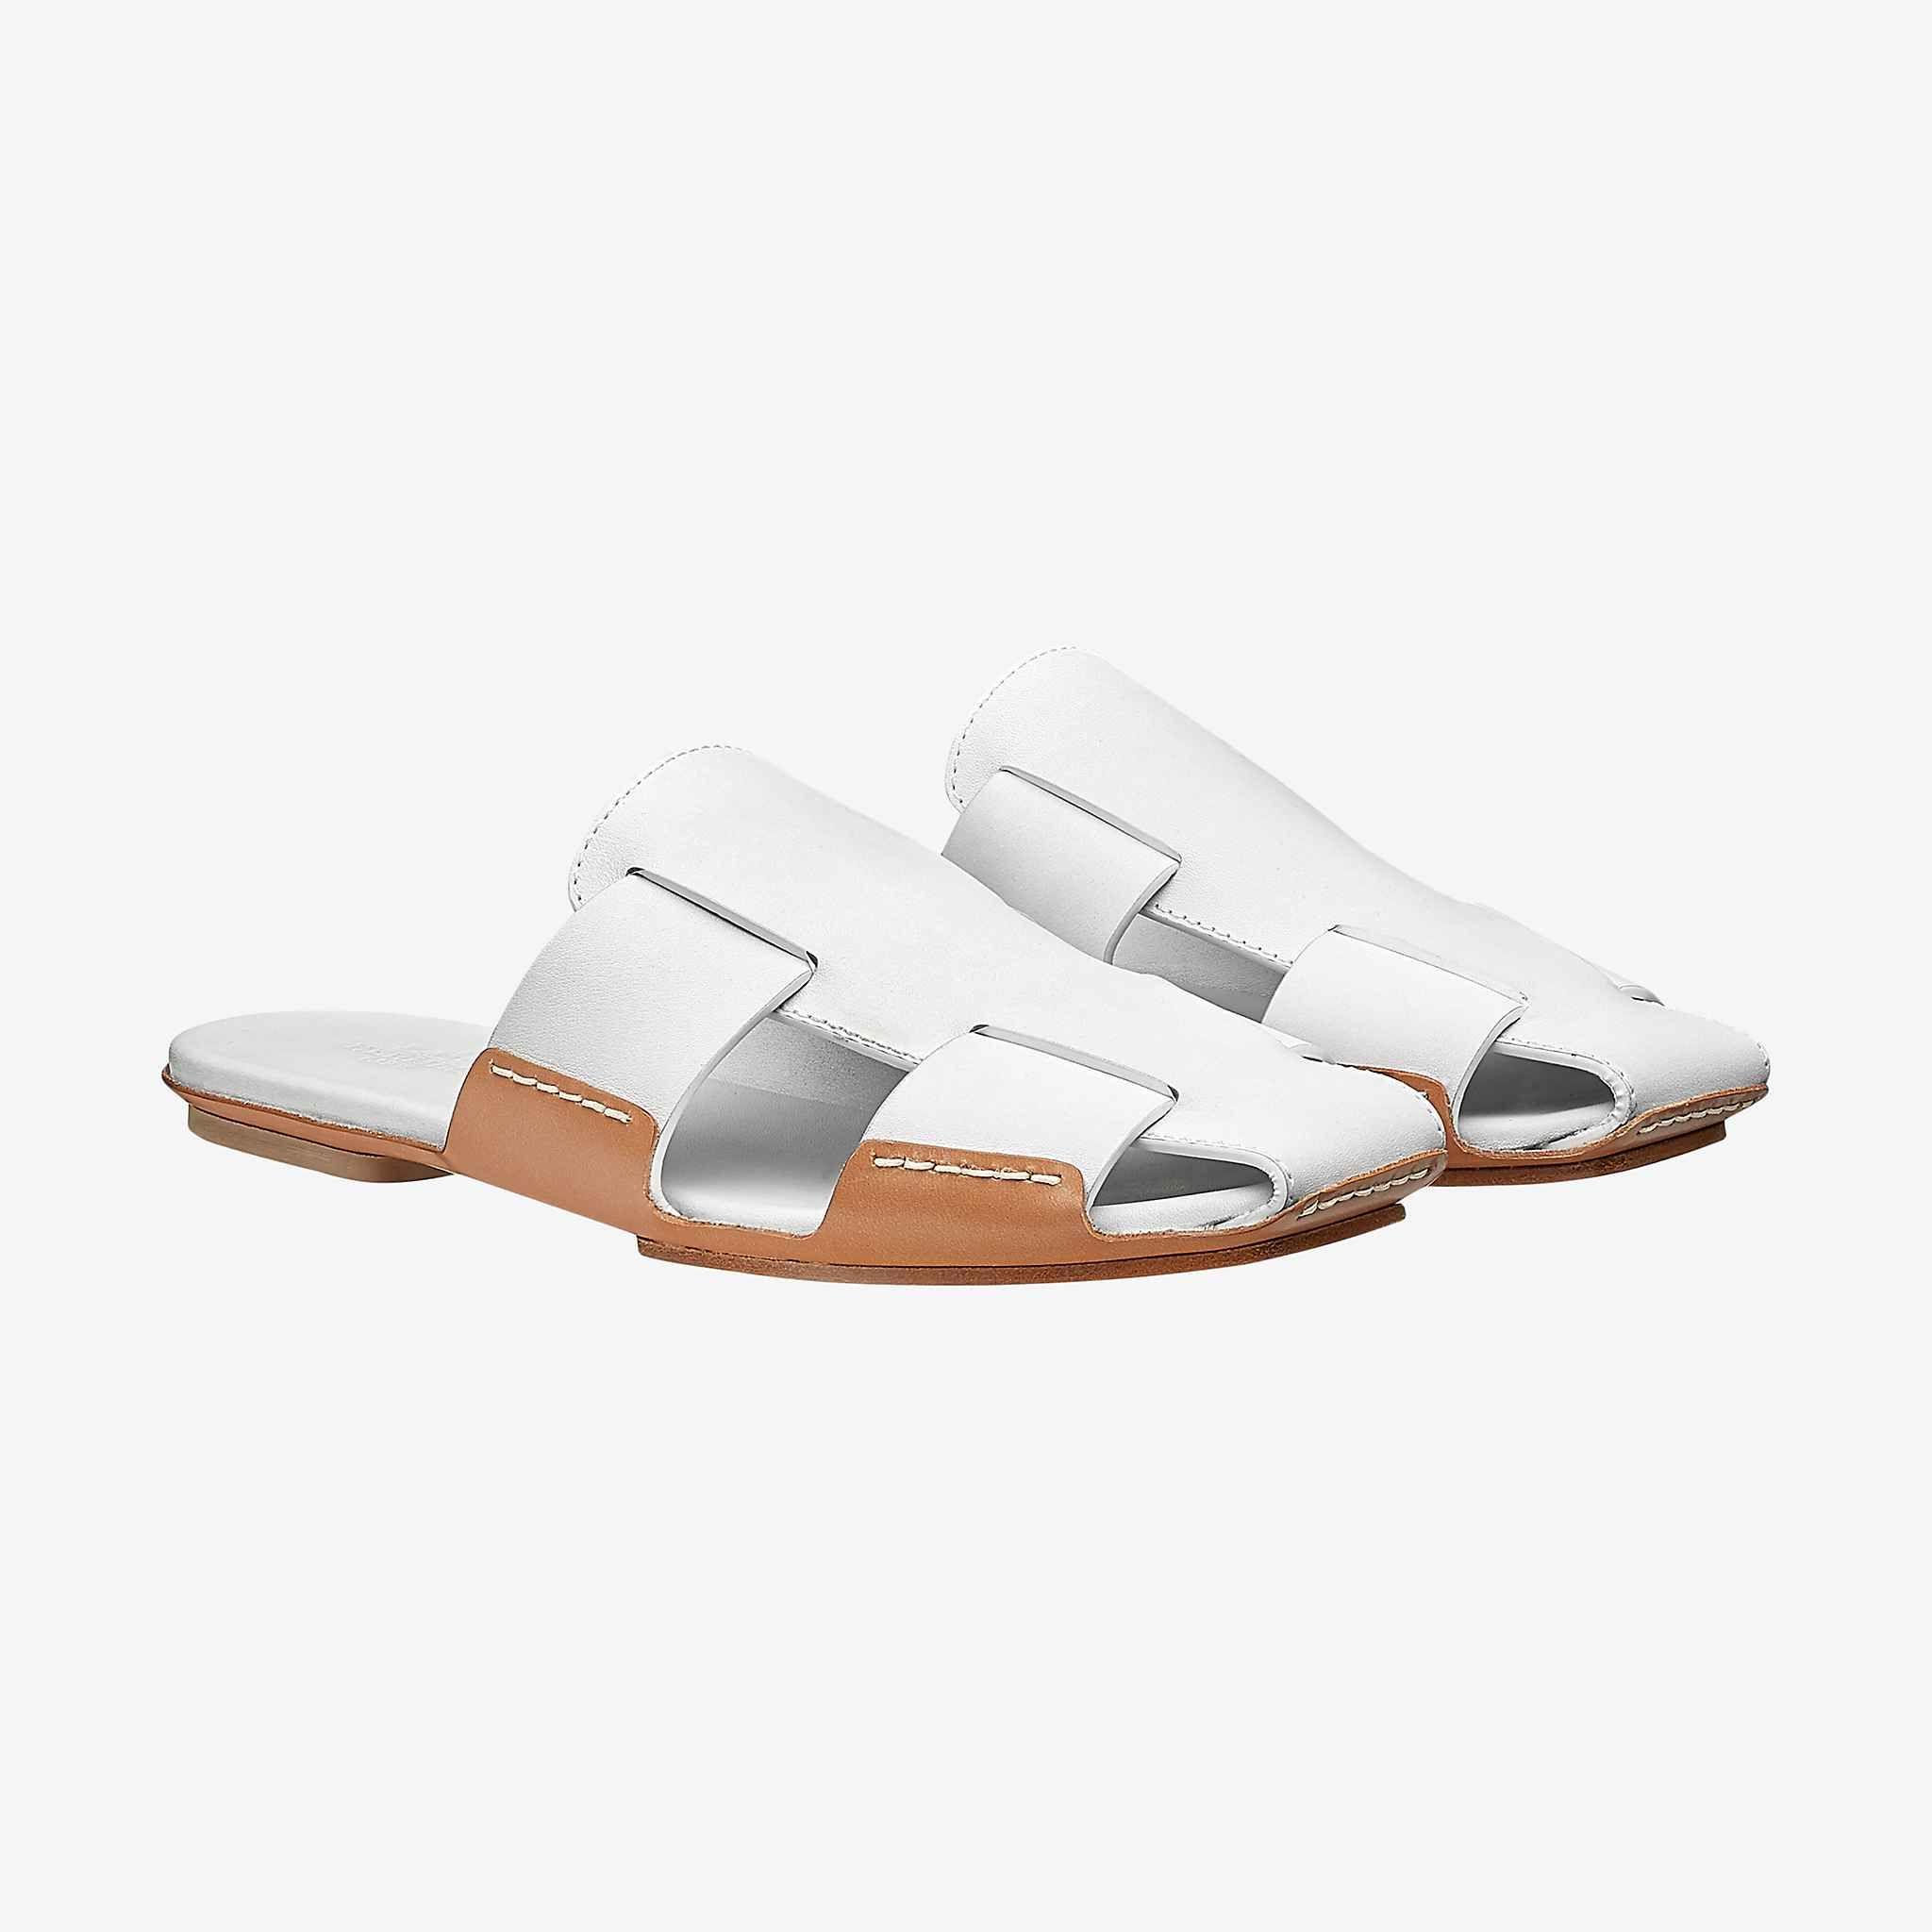 443cccdfcf37 Ruse mule in 2019 | ||SHOES|| | Hermes, Hermes online, Shoes